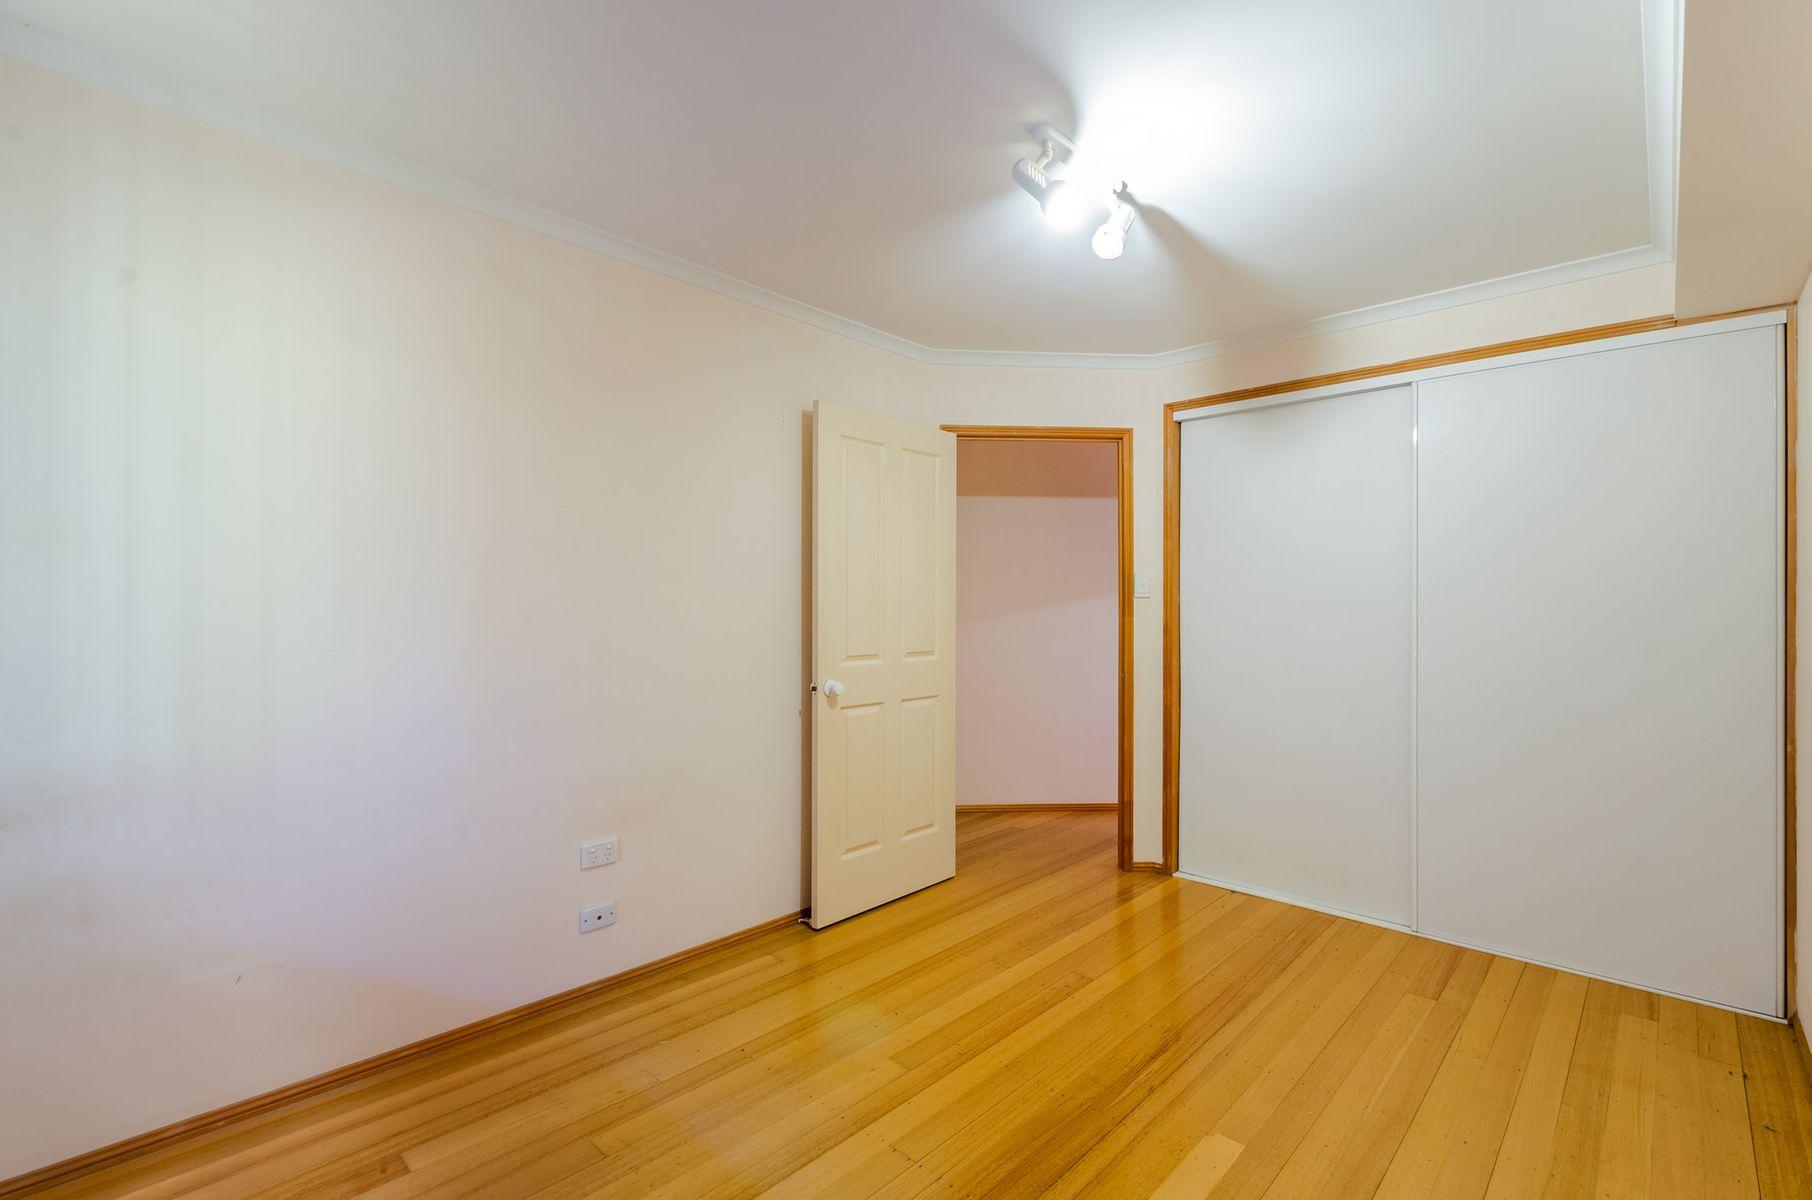 51 Rehbein Avenue, Qunaba, QLD 4670